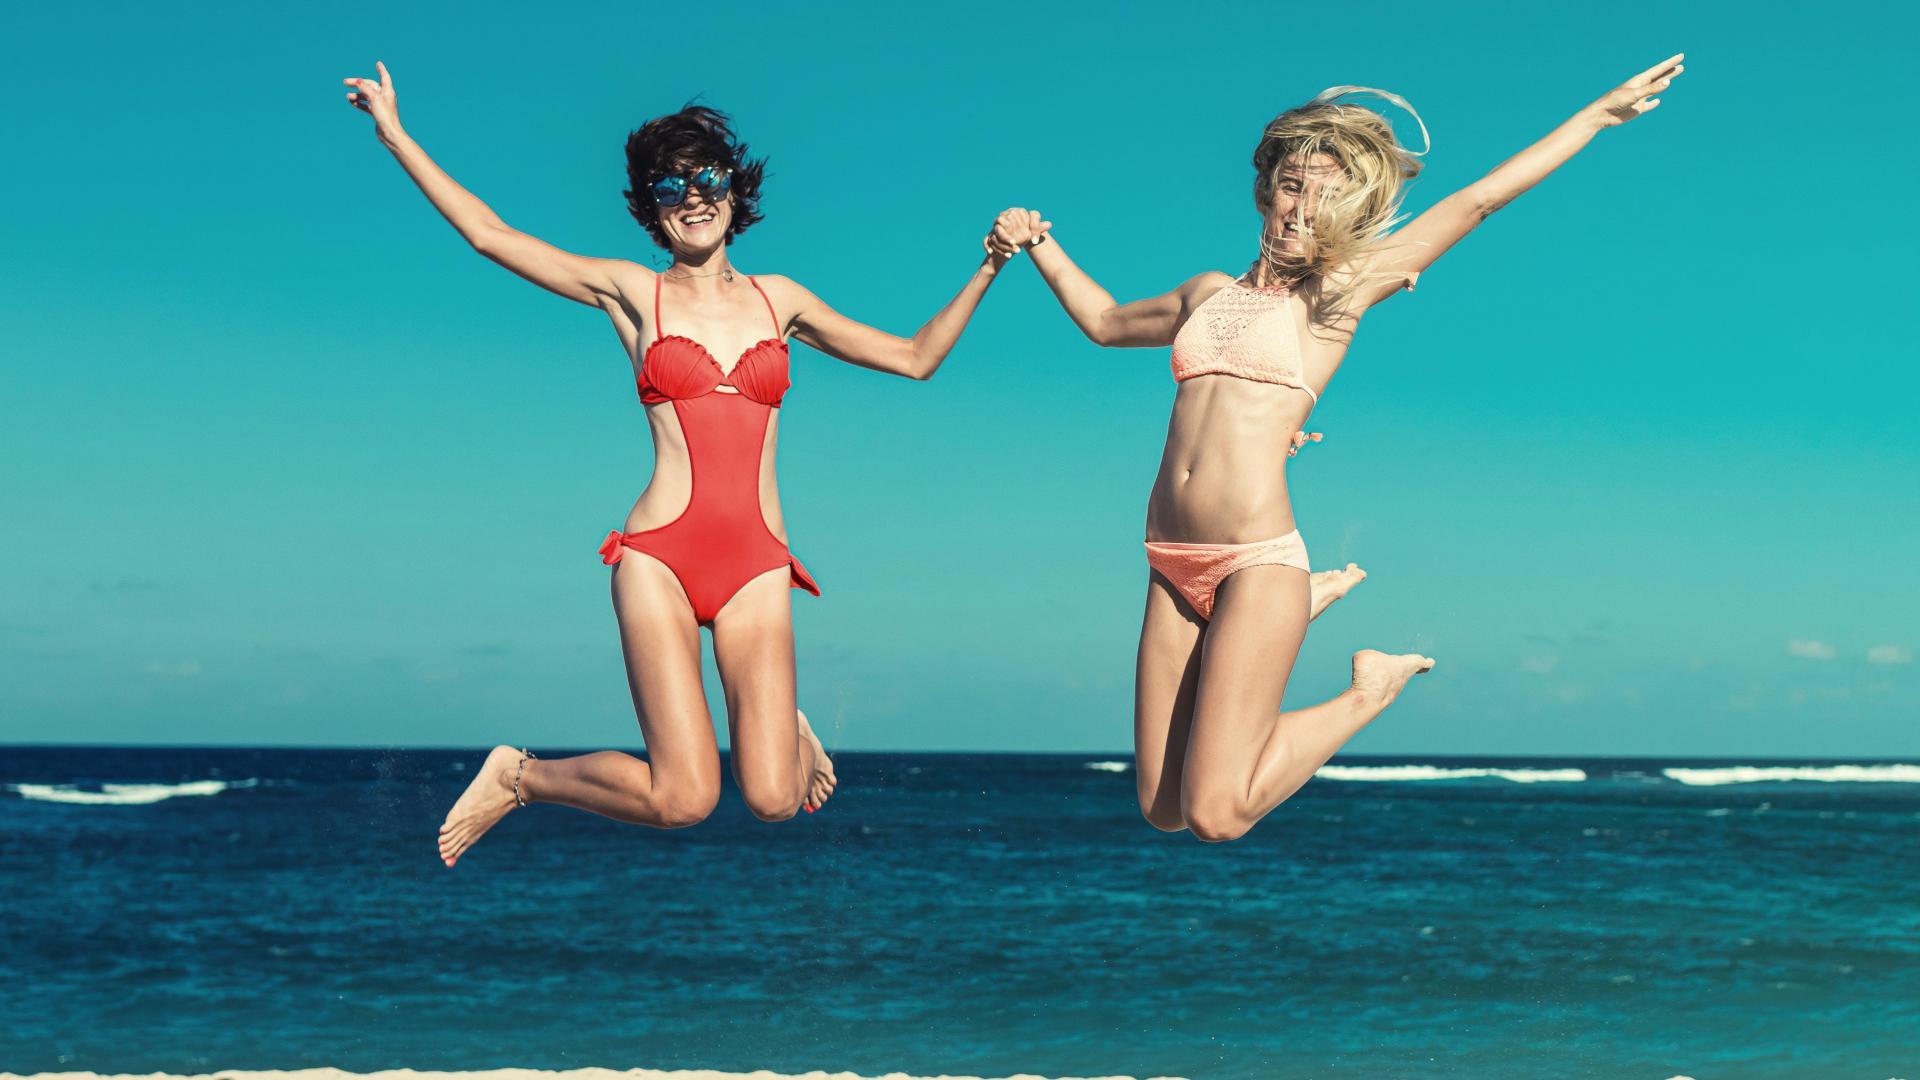 Zwei Freundinnen springen vergnügt hoch am Strand